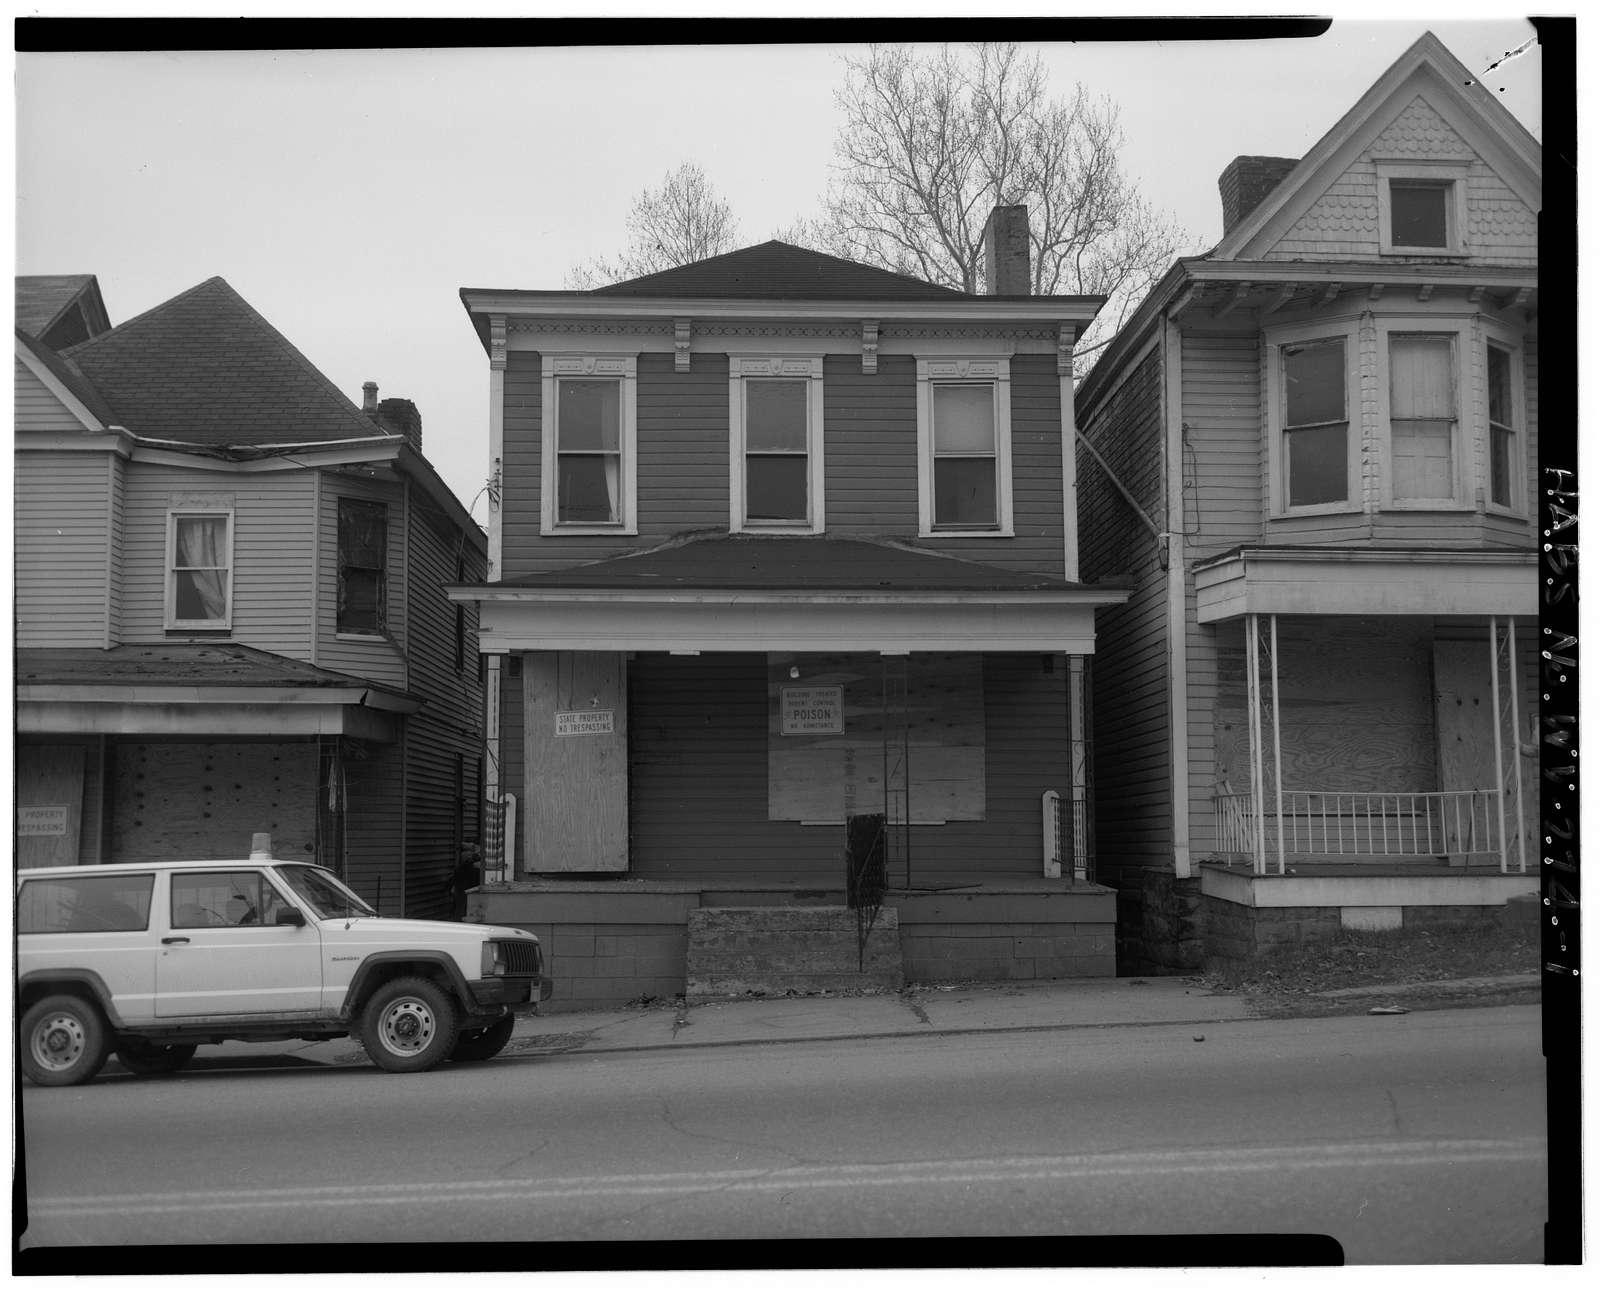 180 Zane Street (House), Wheeling, Ohio County, WV